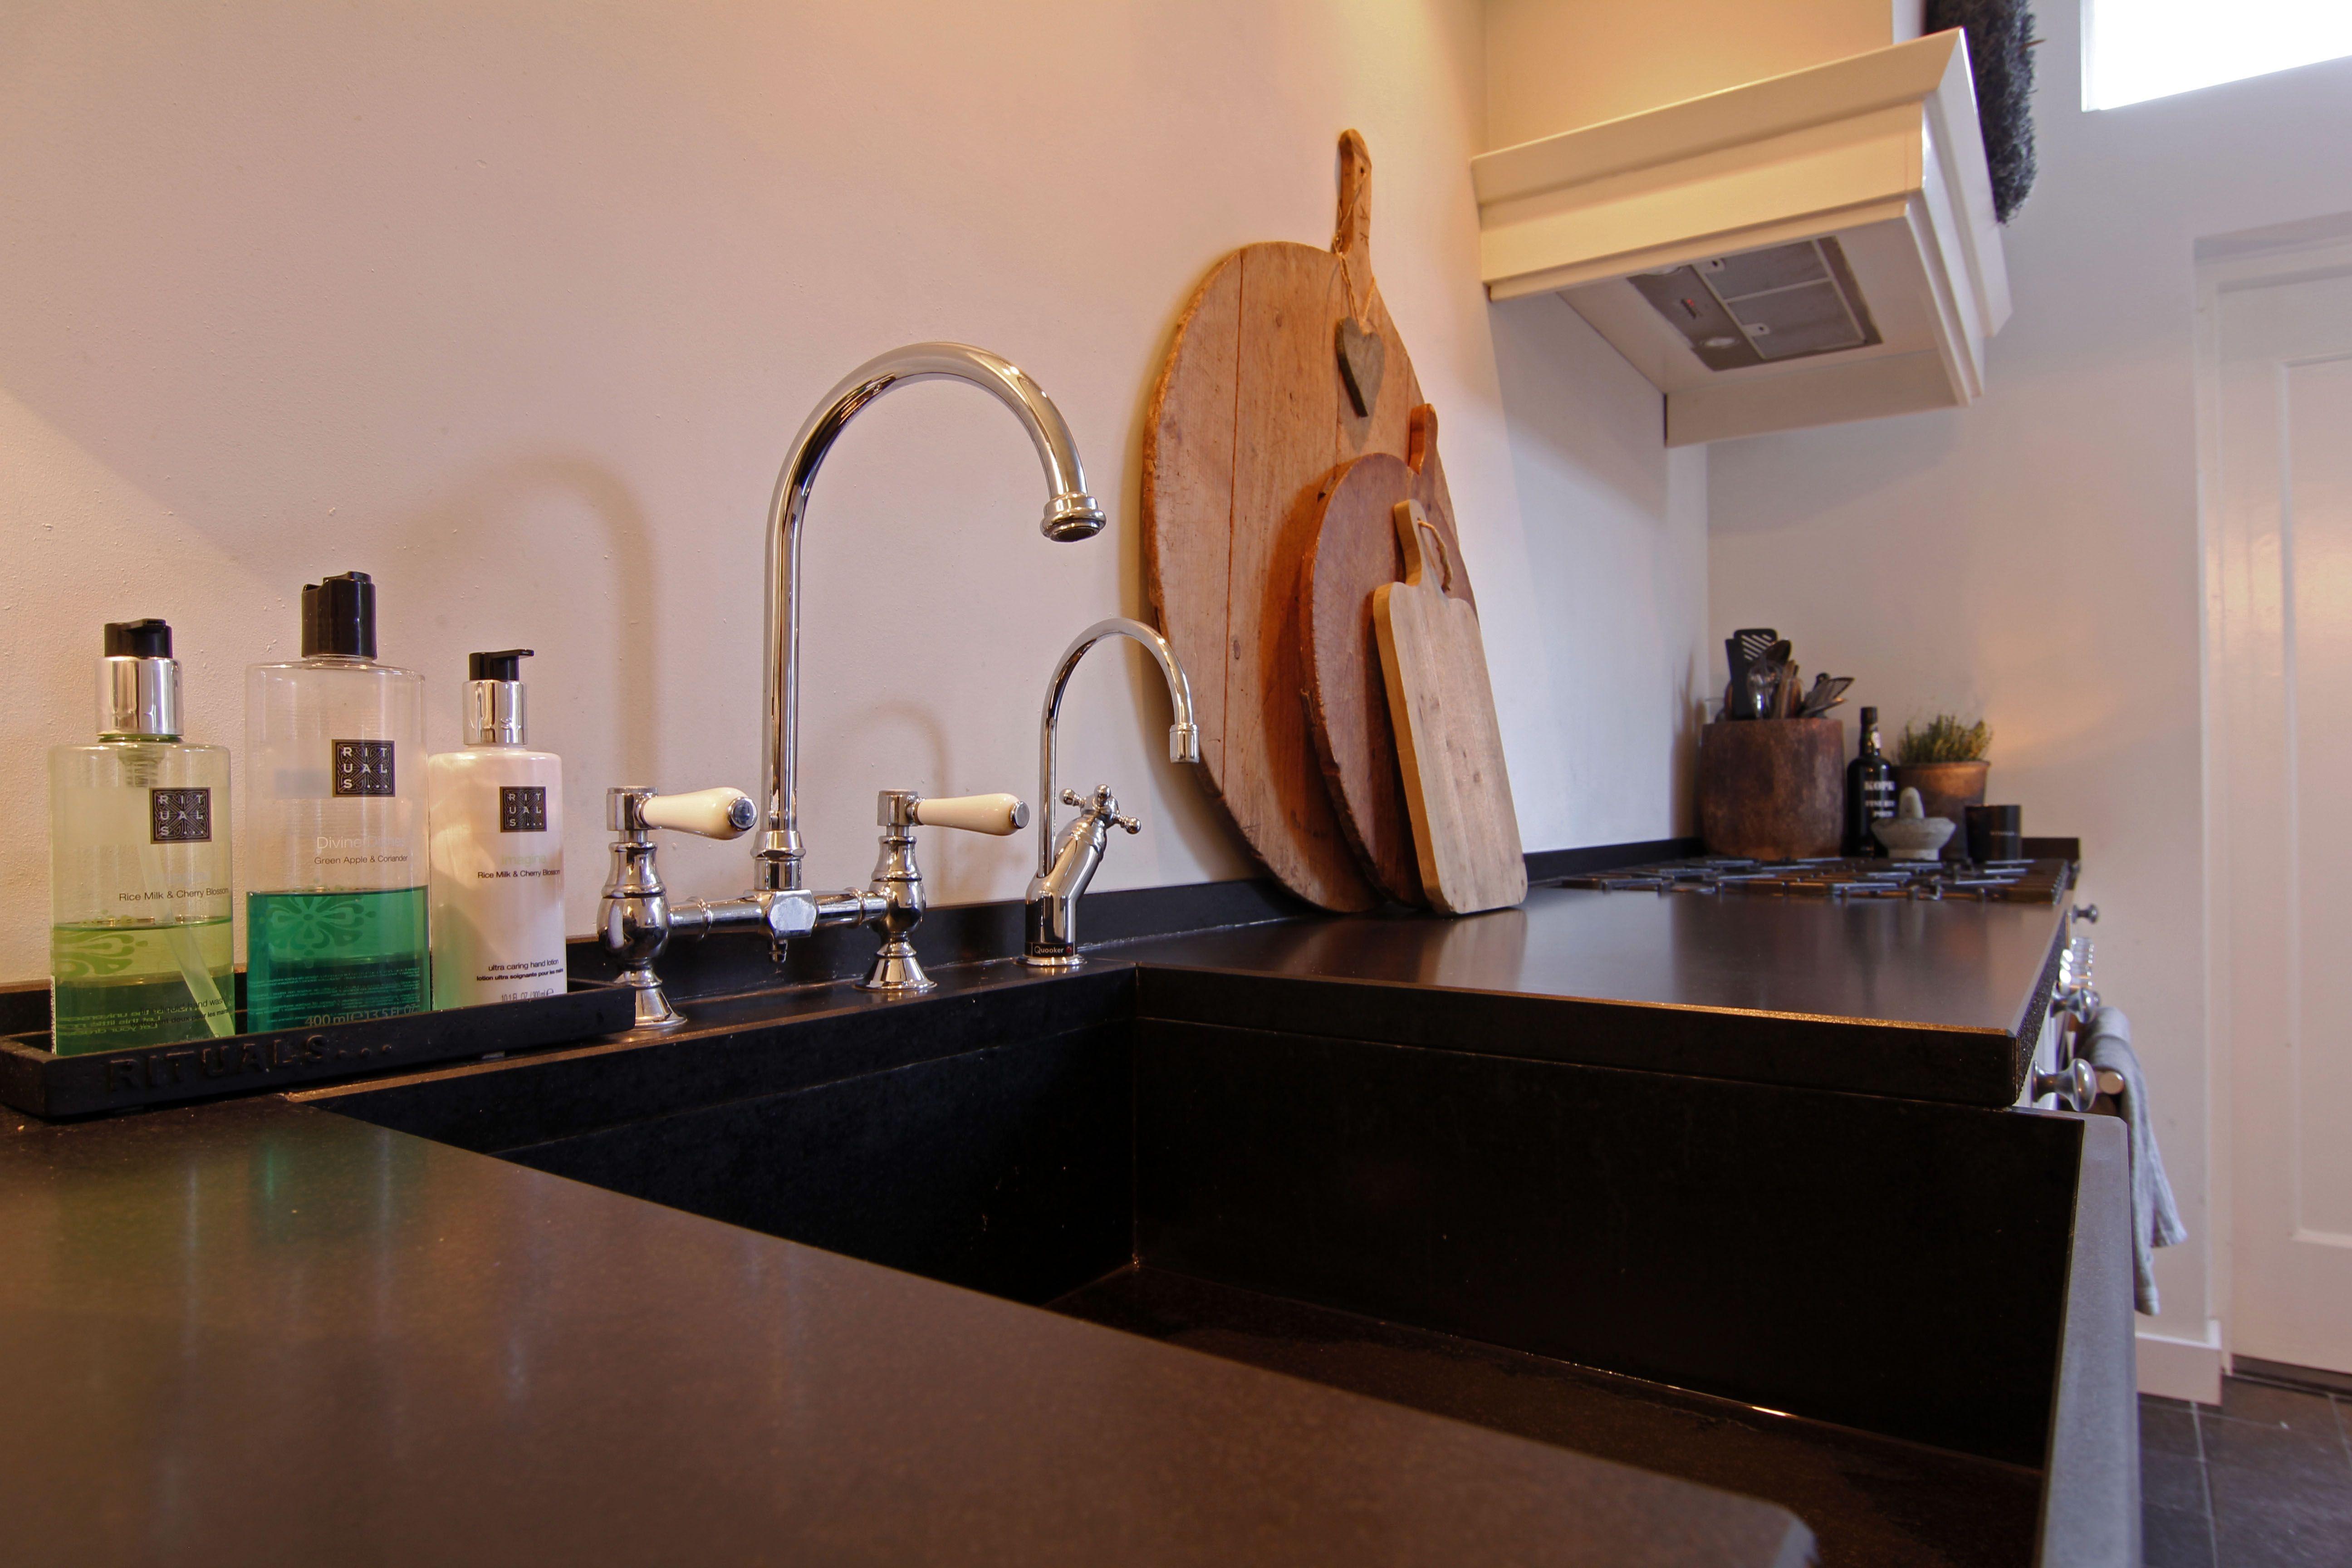 interieur- en stylingadvies Nieveen Interior & Styling | ☆Nieveen ...